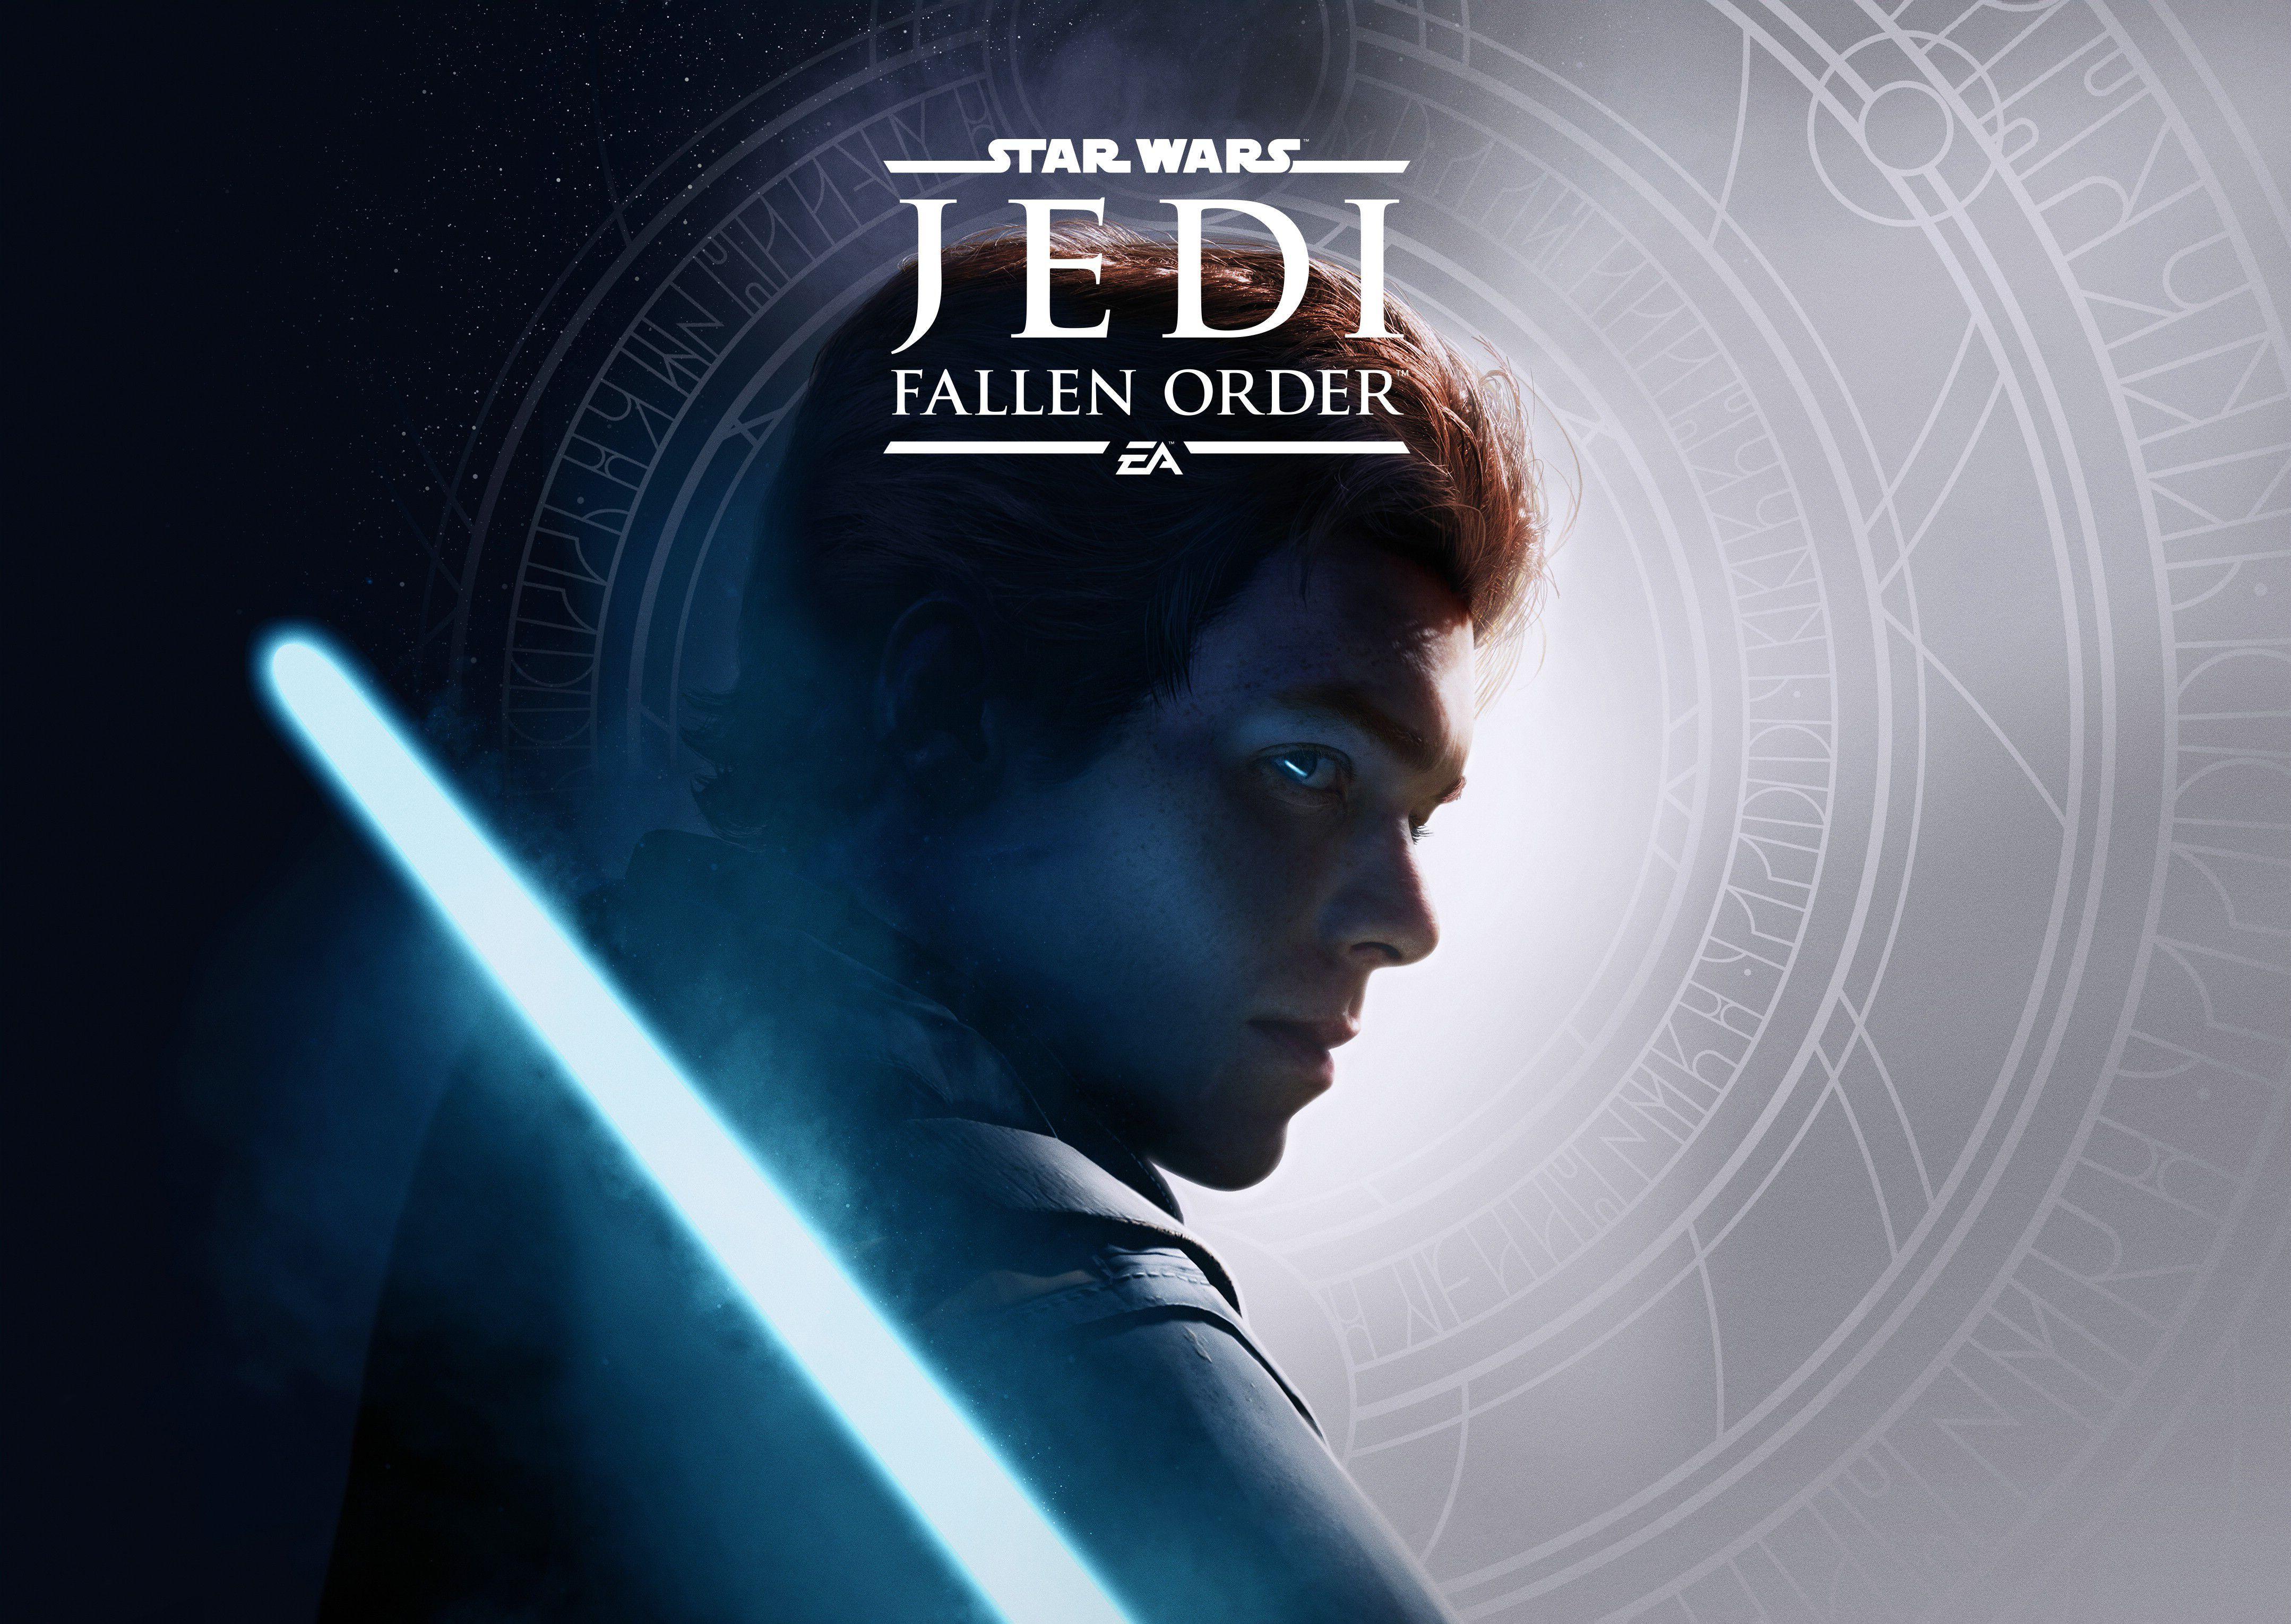 Star Wars Jedi Fallen Order Wallpapers Top Free Star Wars